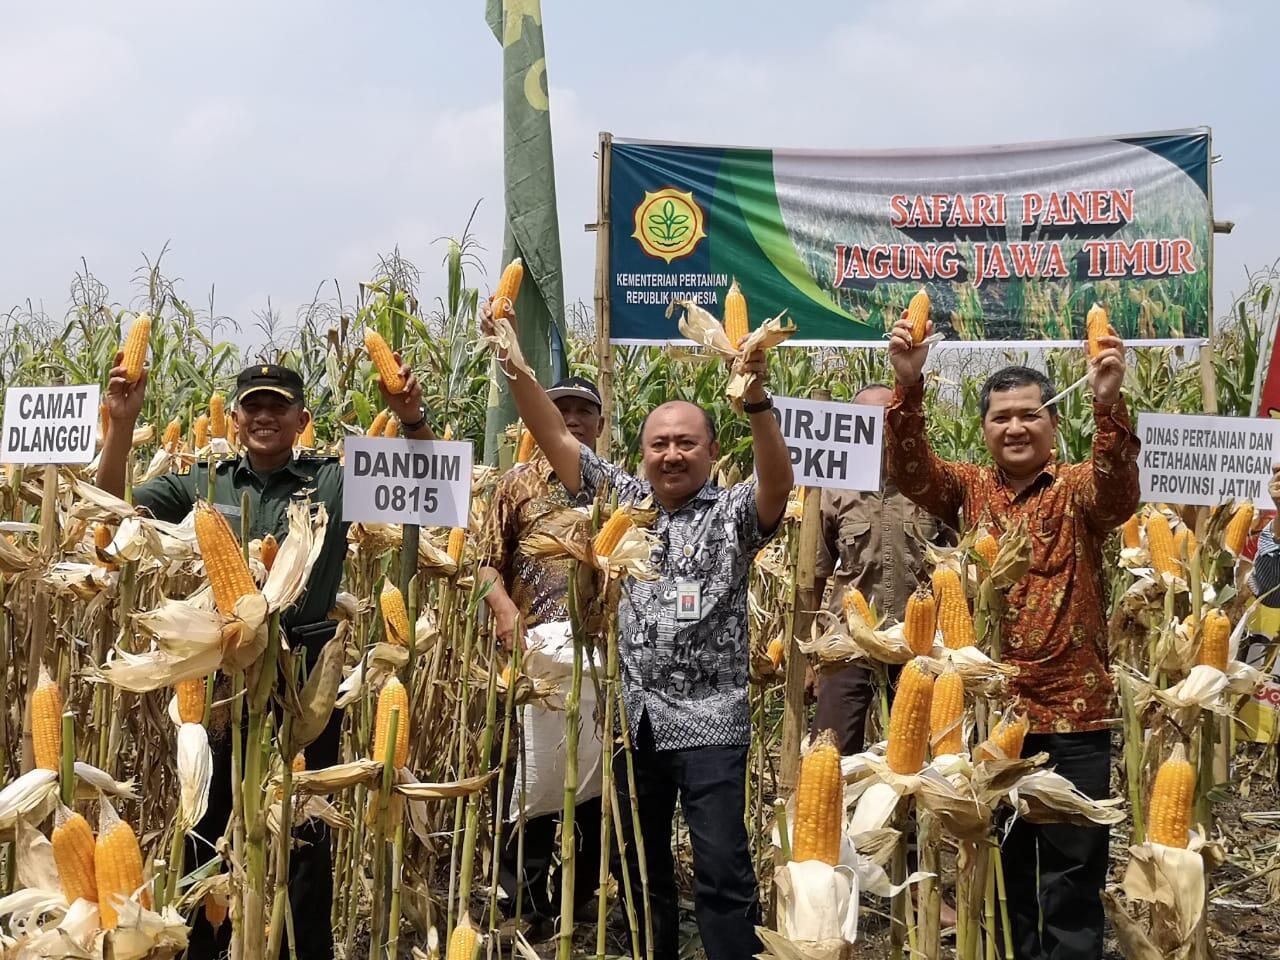 Panen Raya Jagung di Mojokerto, Petani Menikmati Harga yang Baik